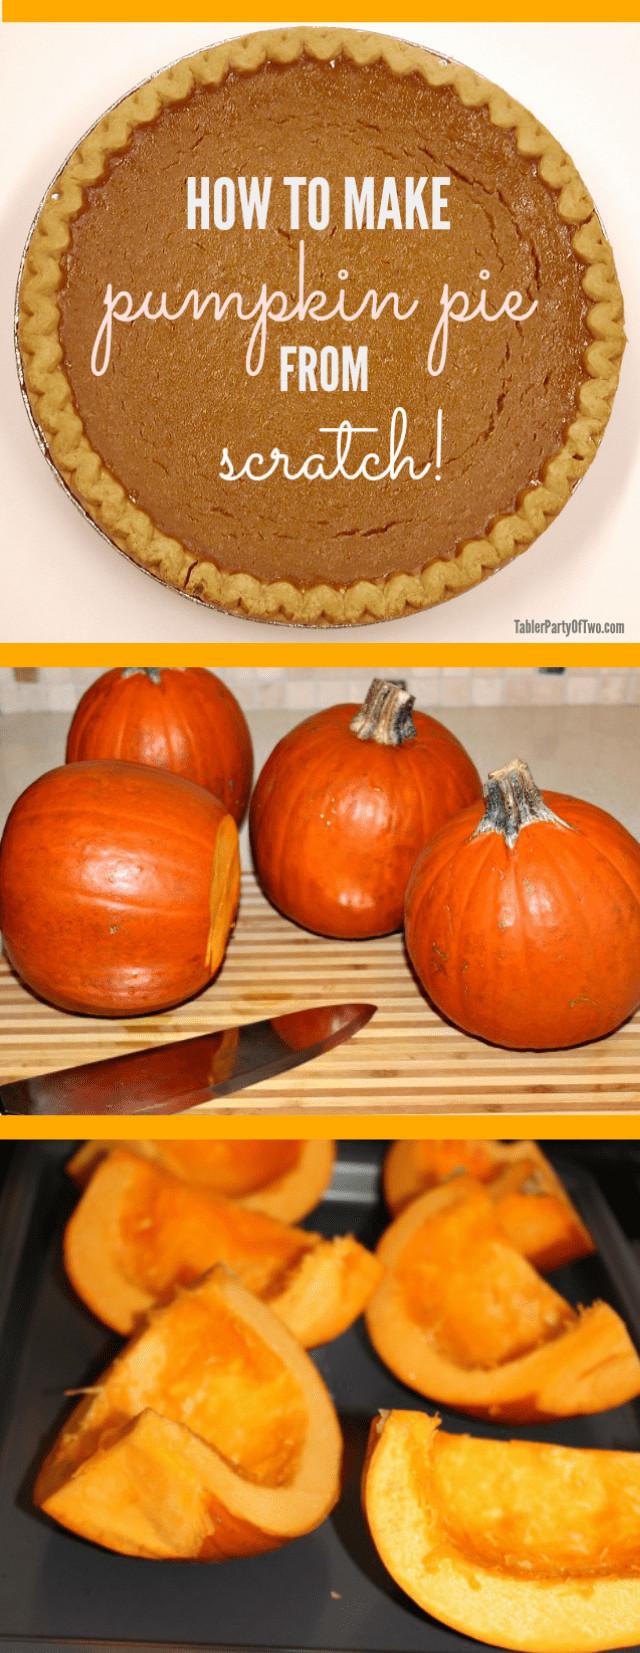 How To Make Pumpkin Pie From Scratch  Homemade Pumpkin Puree for Scratch Pumpkin Pie